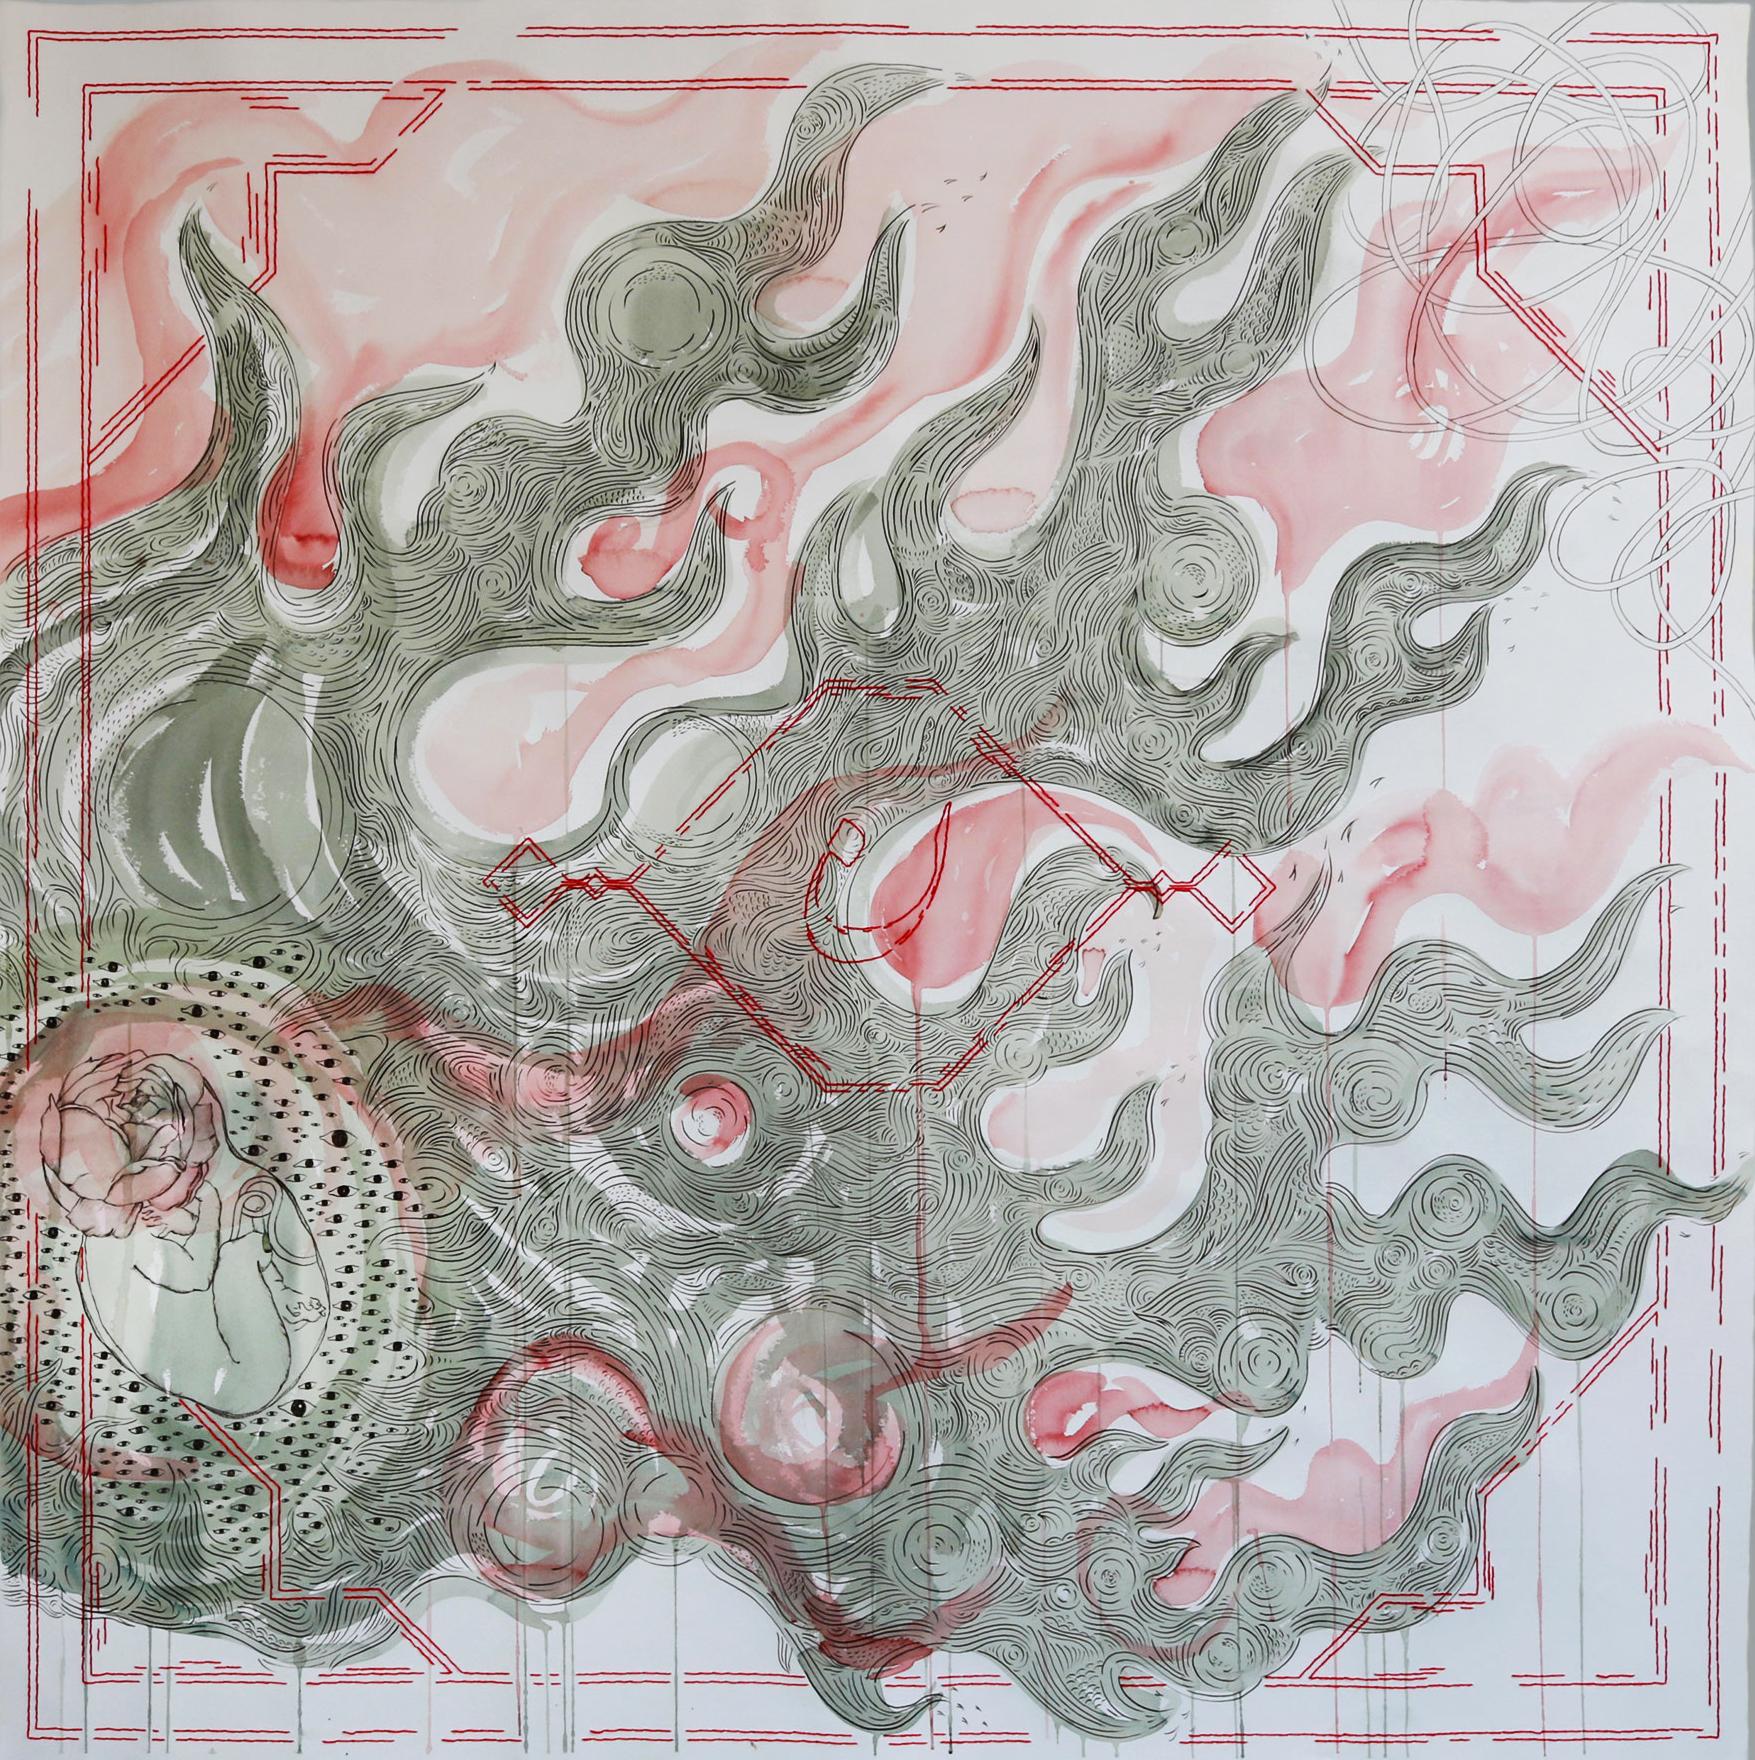 iranian-contemporary-artist-shilla-shakoori